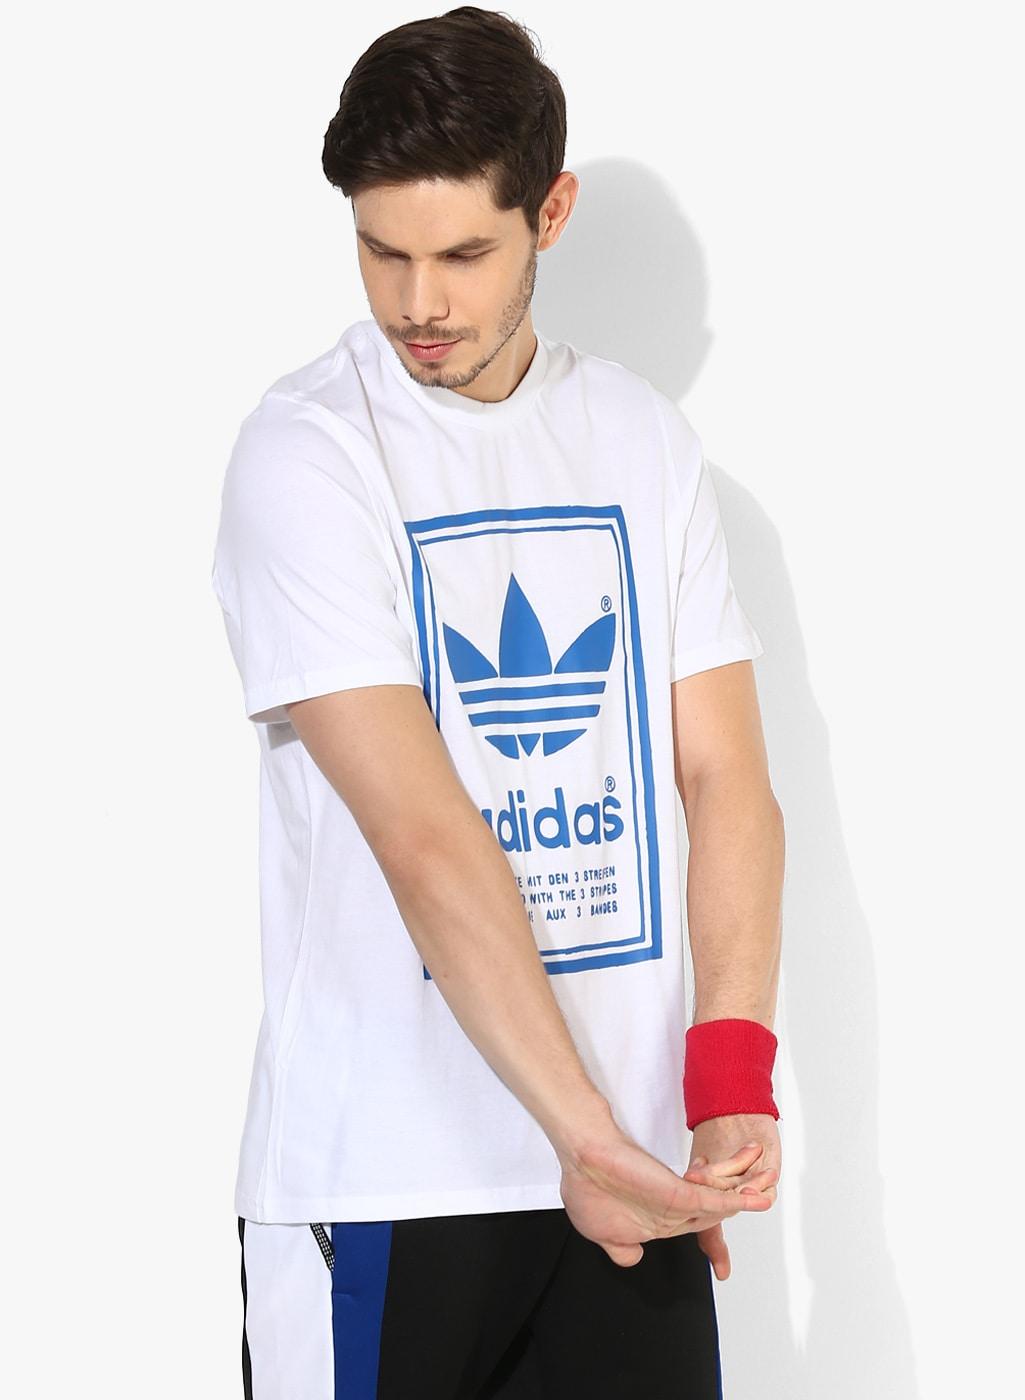 sale retailer e6912 e9ecf Clothing - Buy Clothes for Men, Women   Kids Online   Myntra